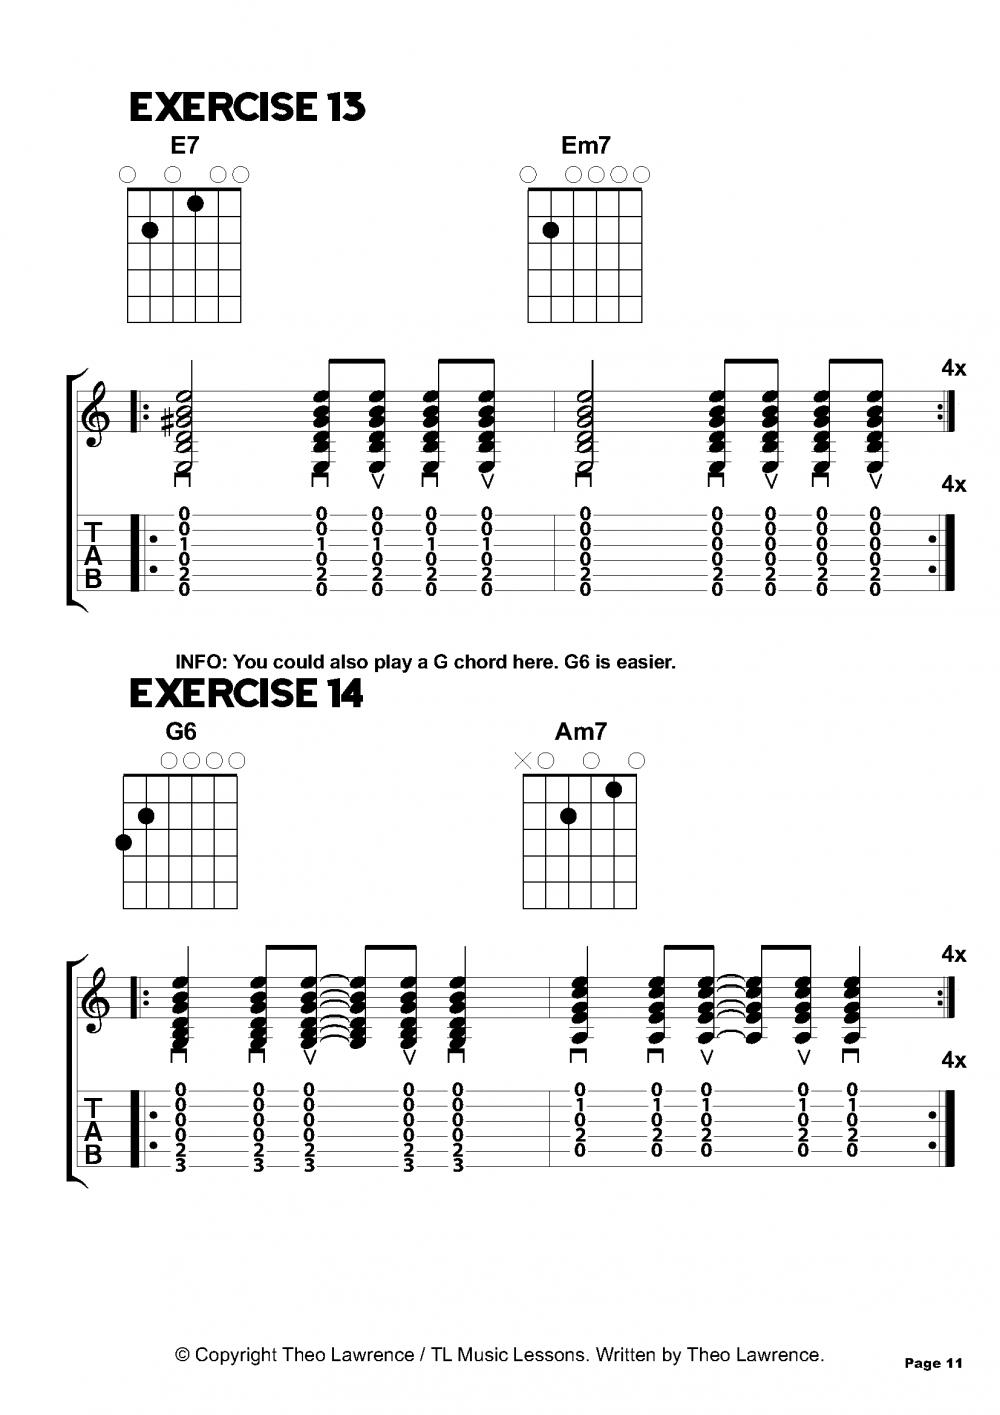 Chord Exercises 13 14 For Beginners Guitar And Ukulele Guitar